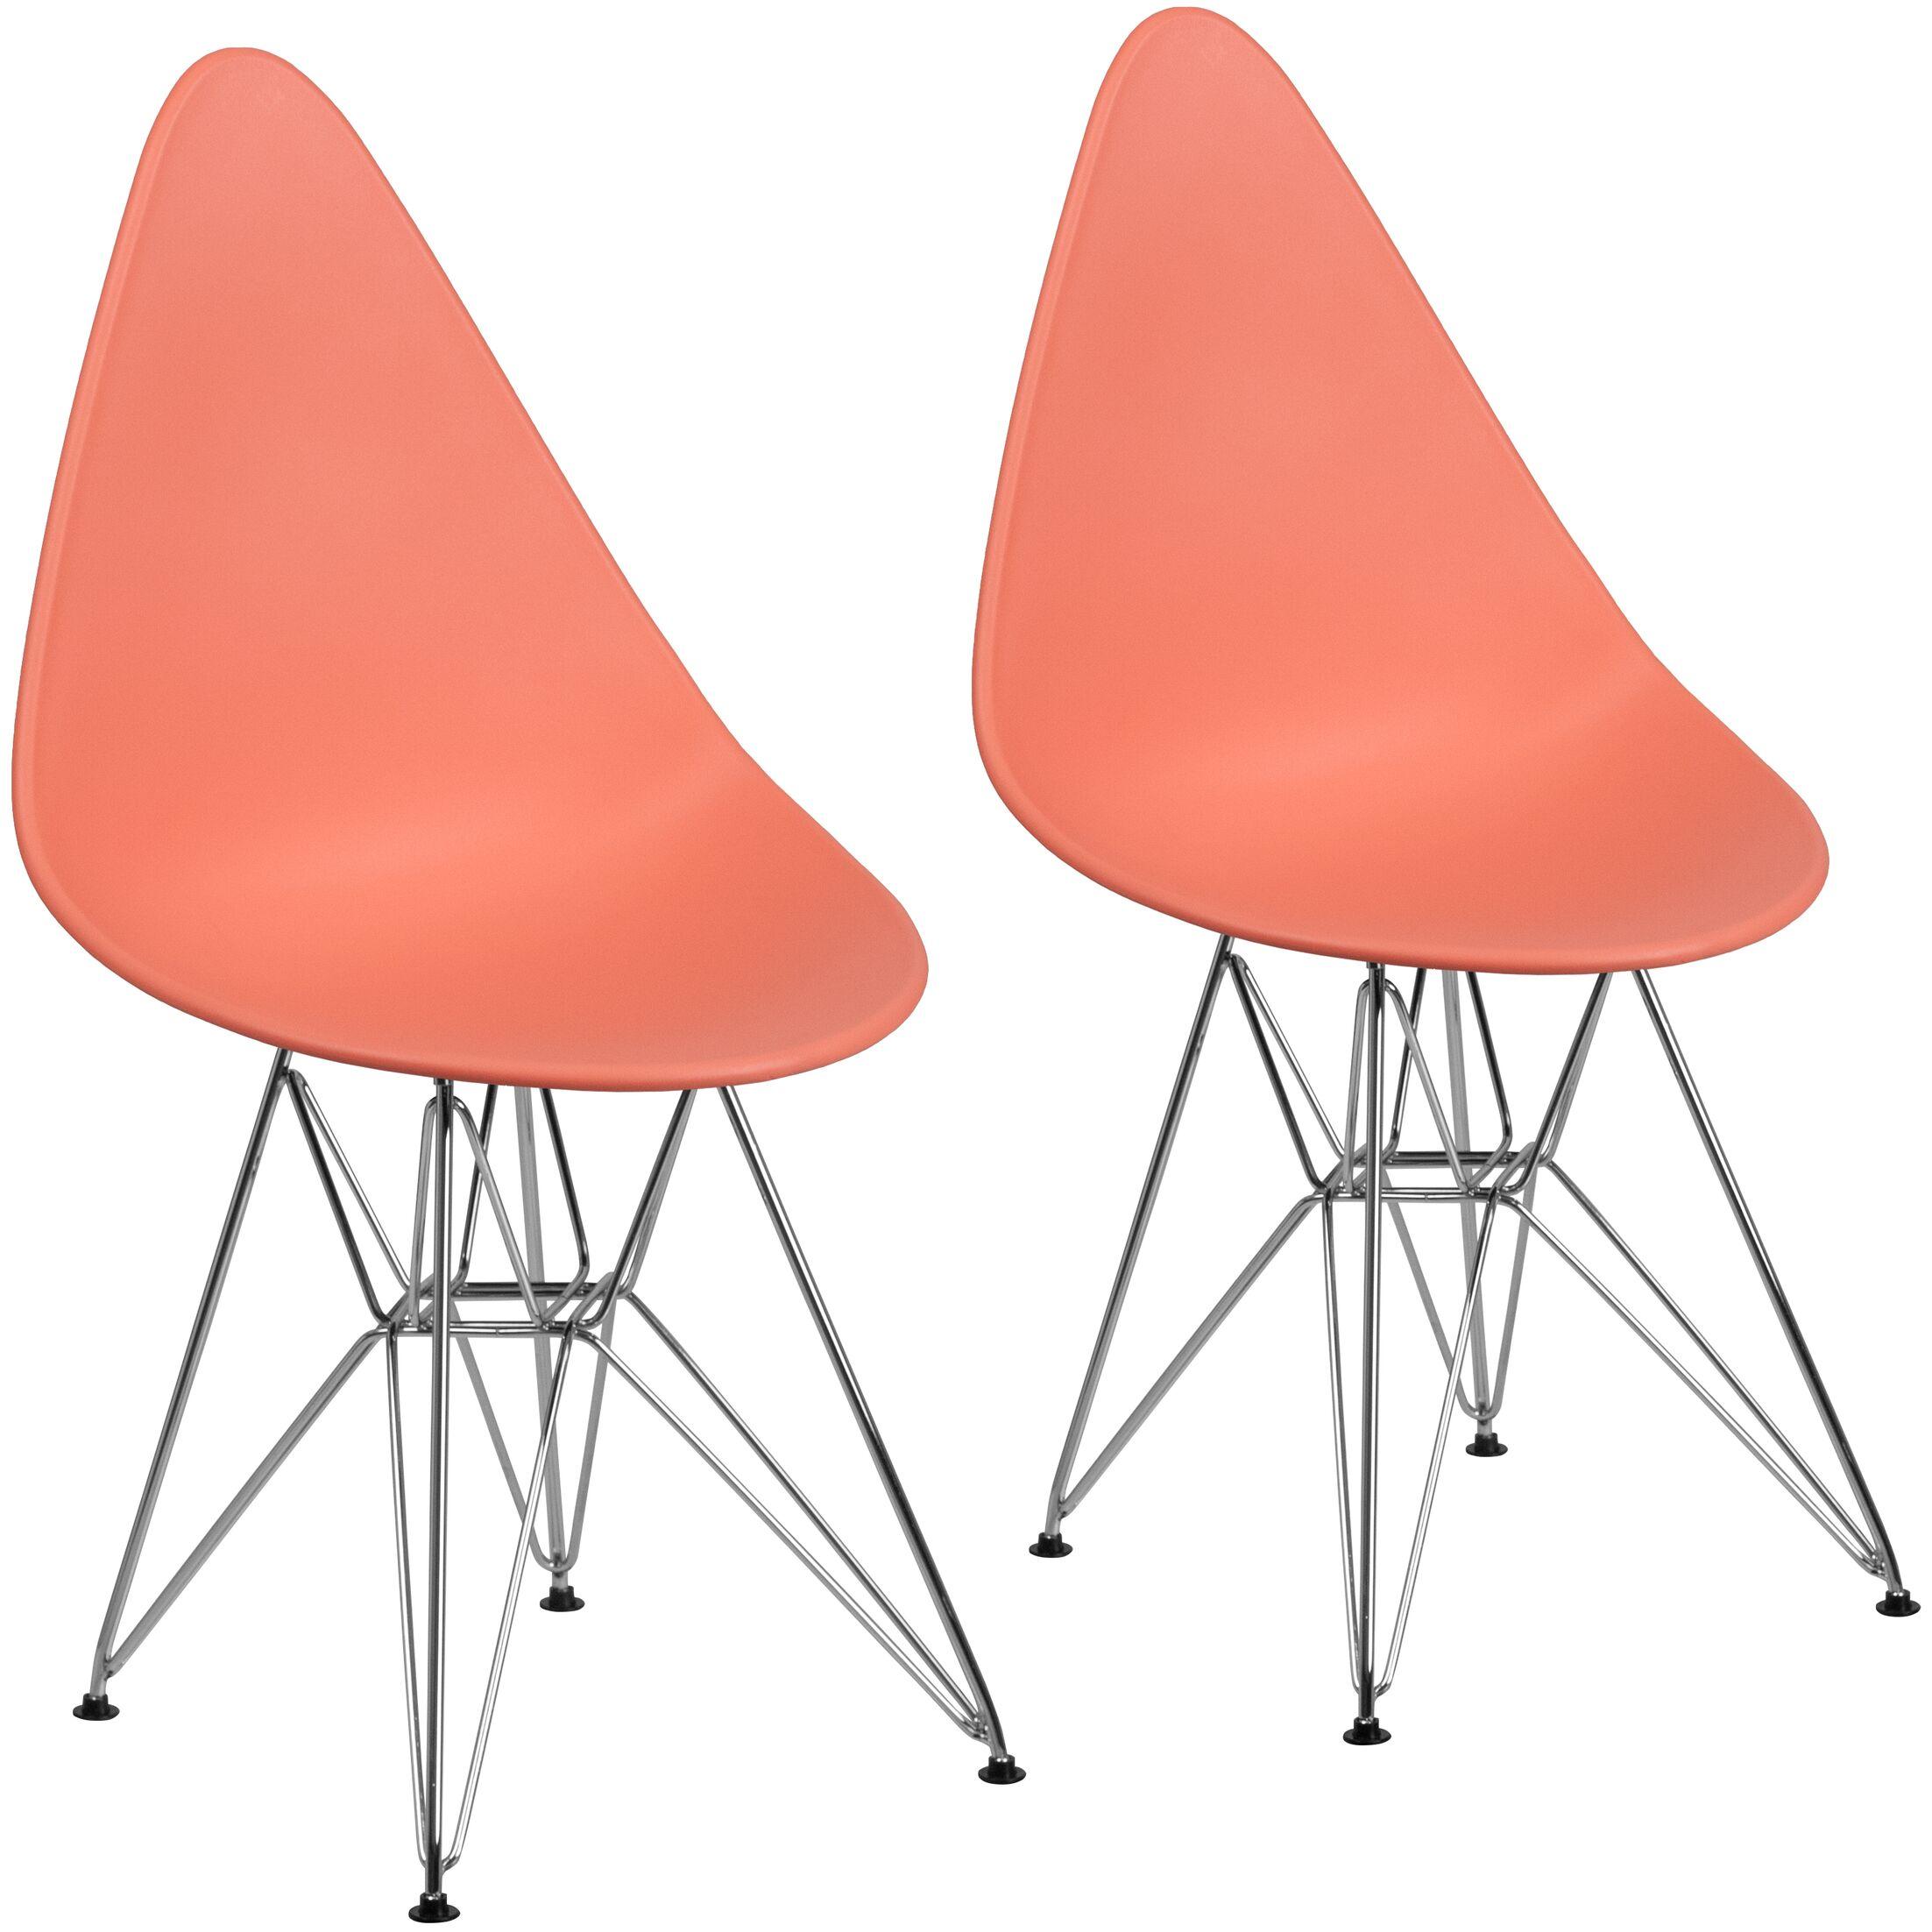 Resto Guest Chair Seat Color: Peach